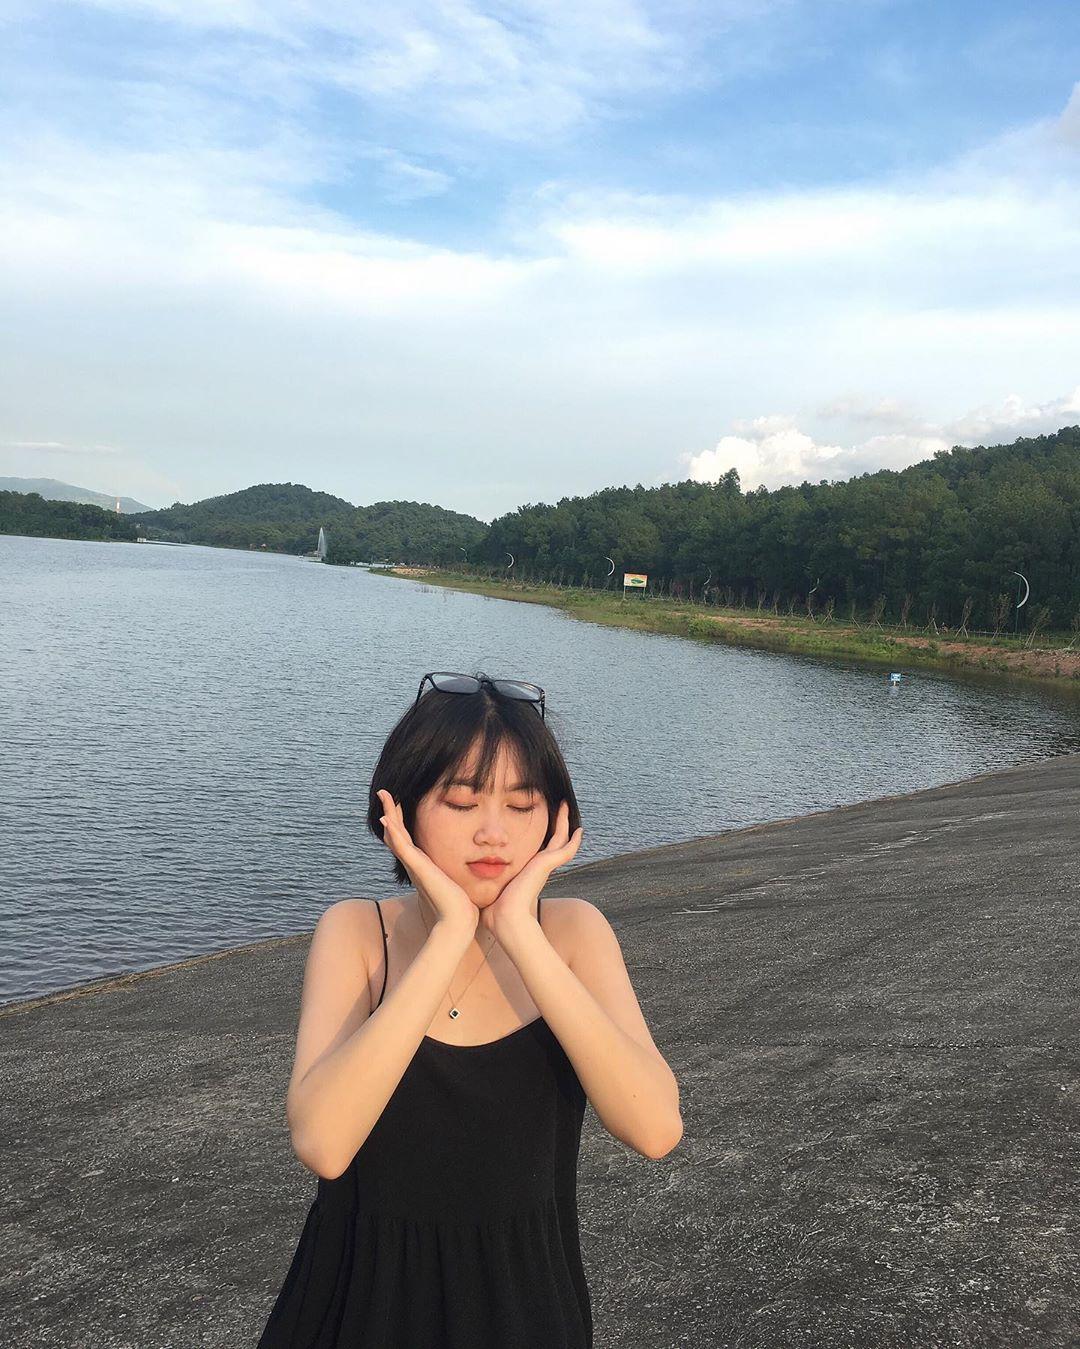 Quangninh_khu-du-lich-ho-yen-trung-11